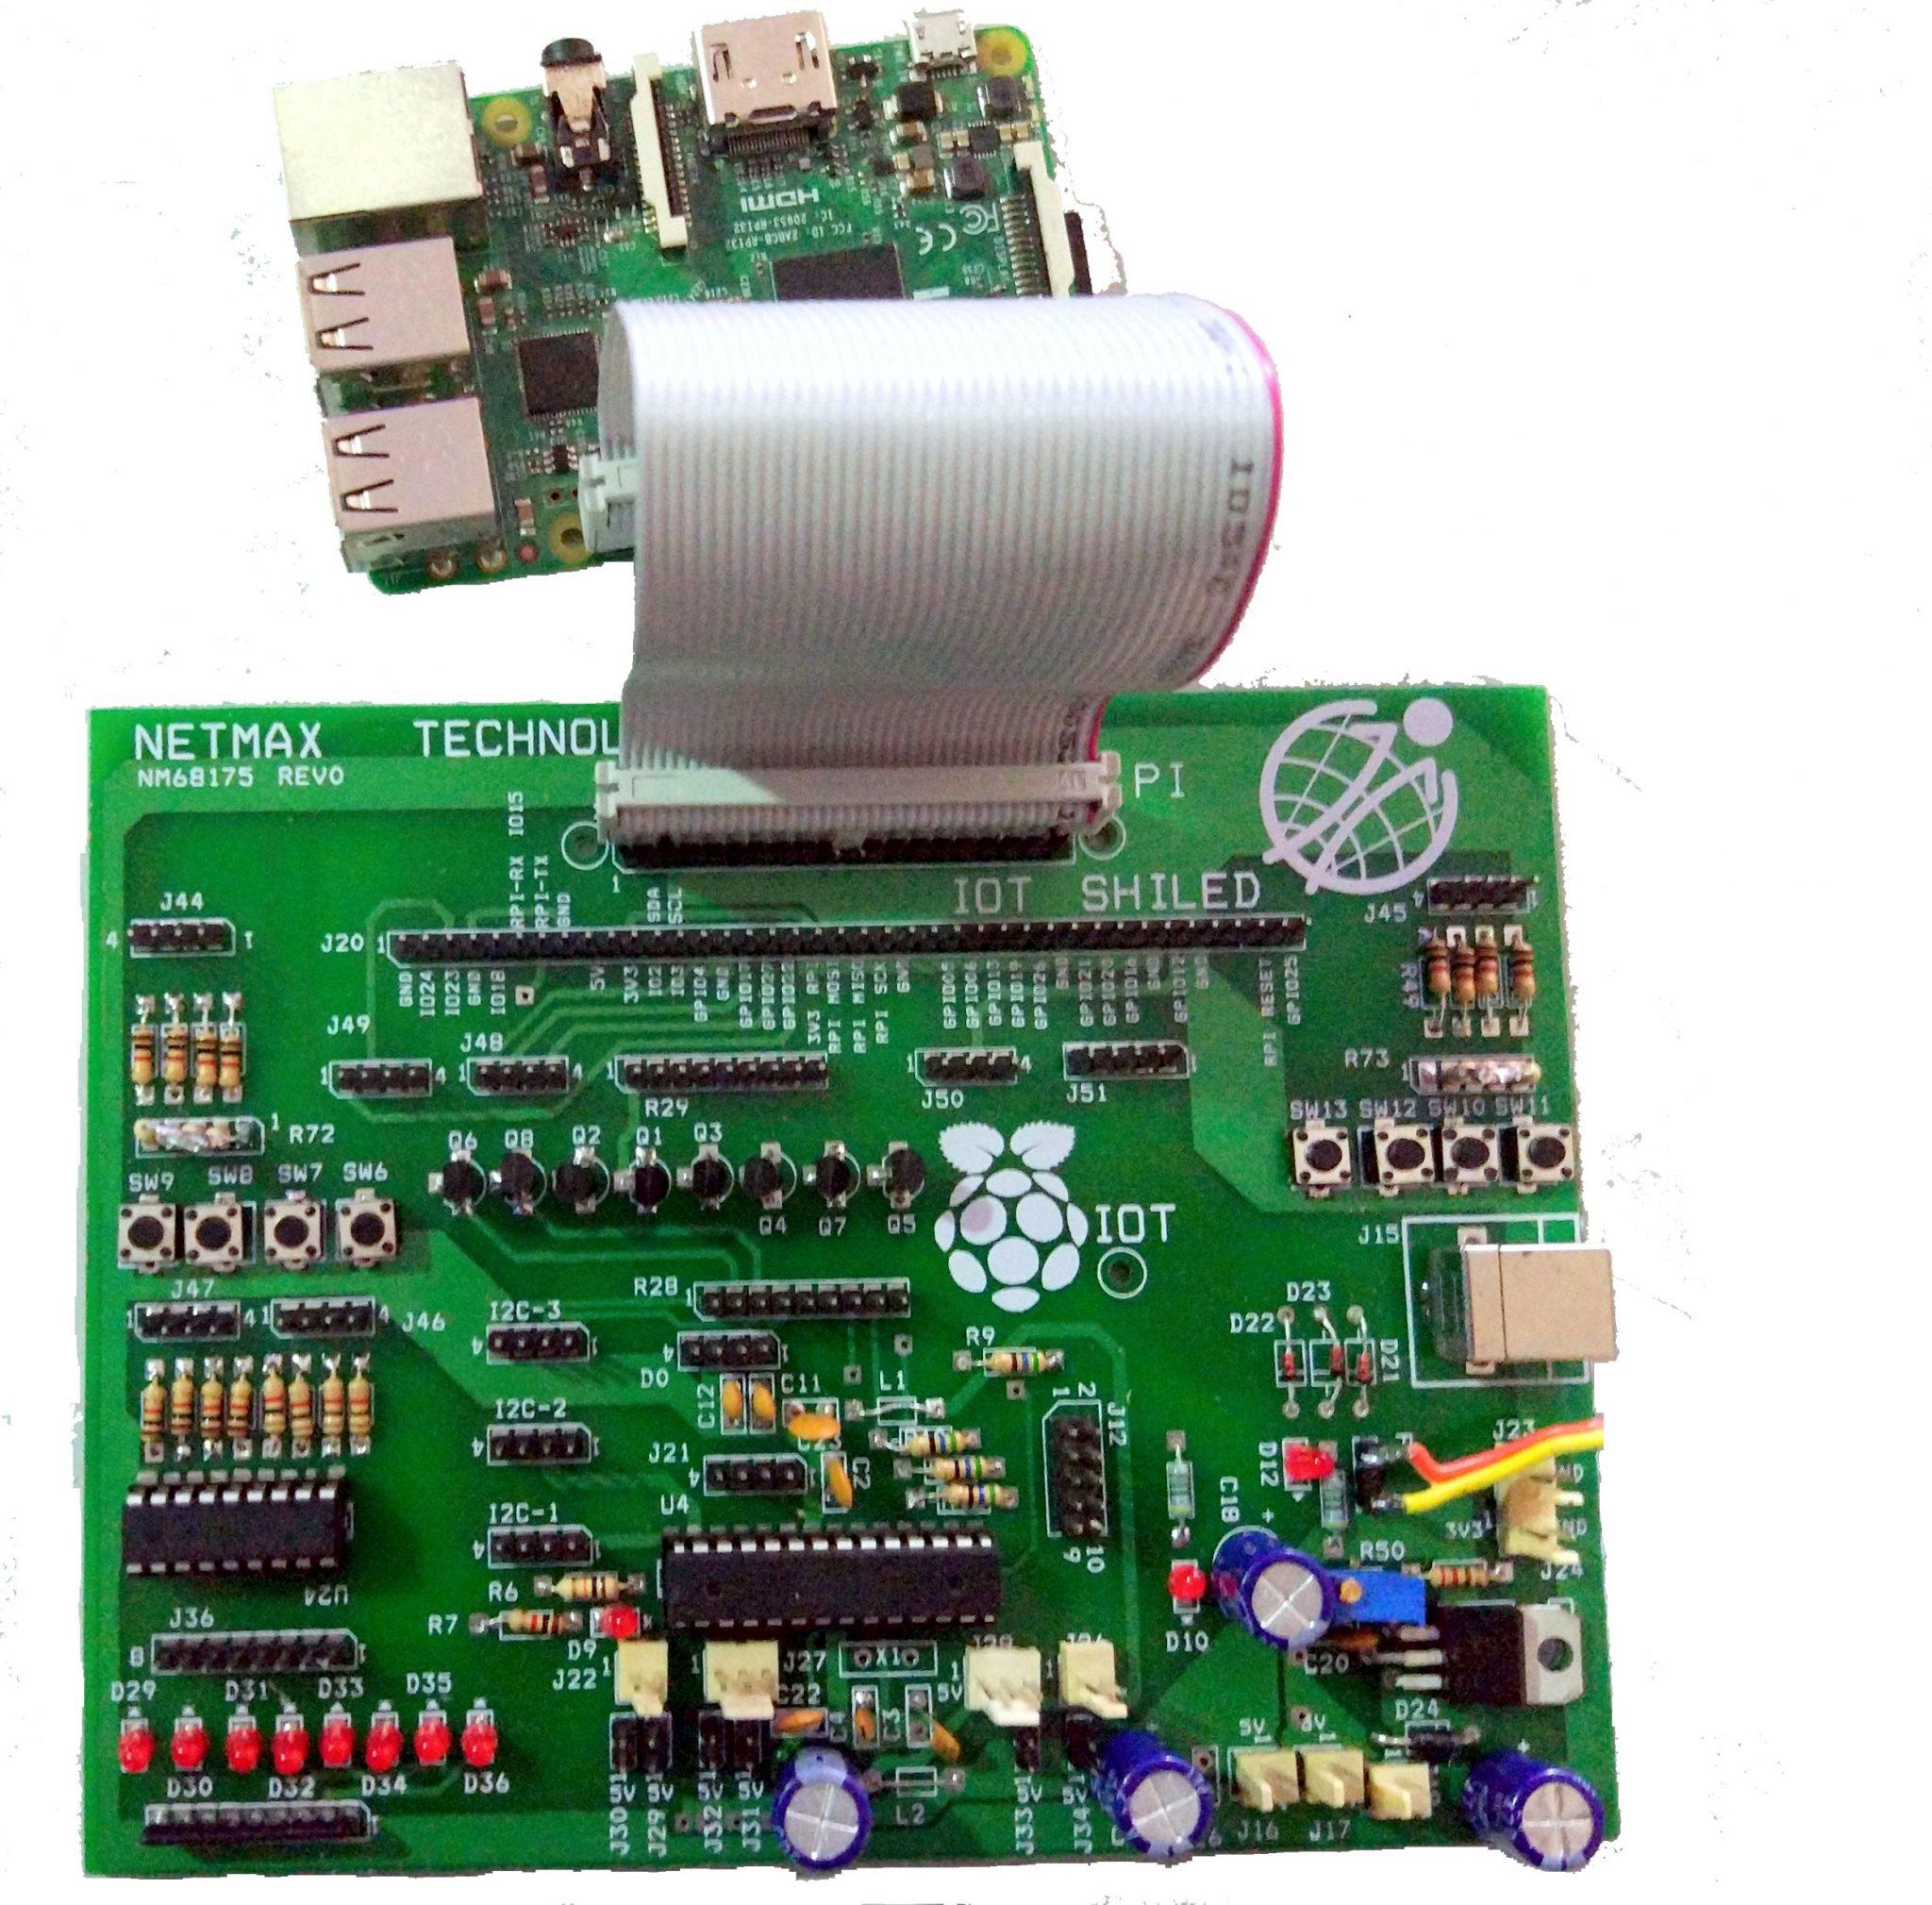 Netmax Iot Shield 2019 iot shield Netmax IOT Shield For Raspberry Pi with Netmaxiot Python Framework Netmax Iot Shield 2019